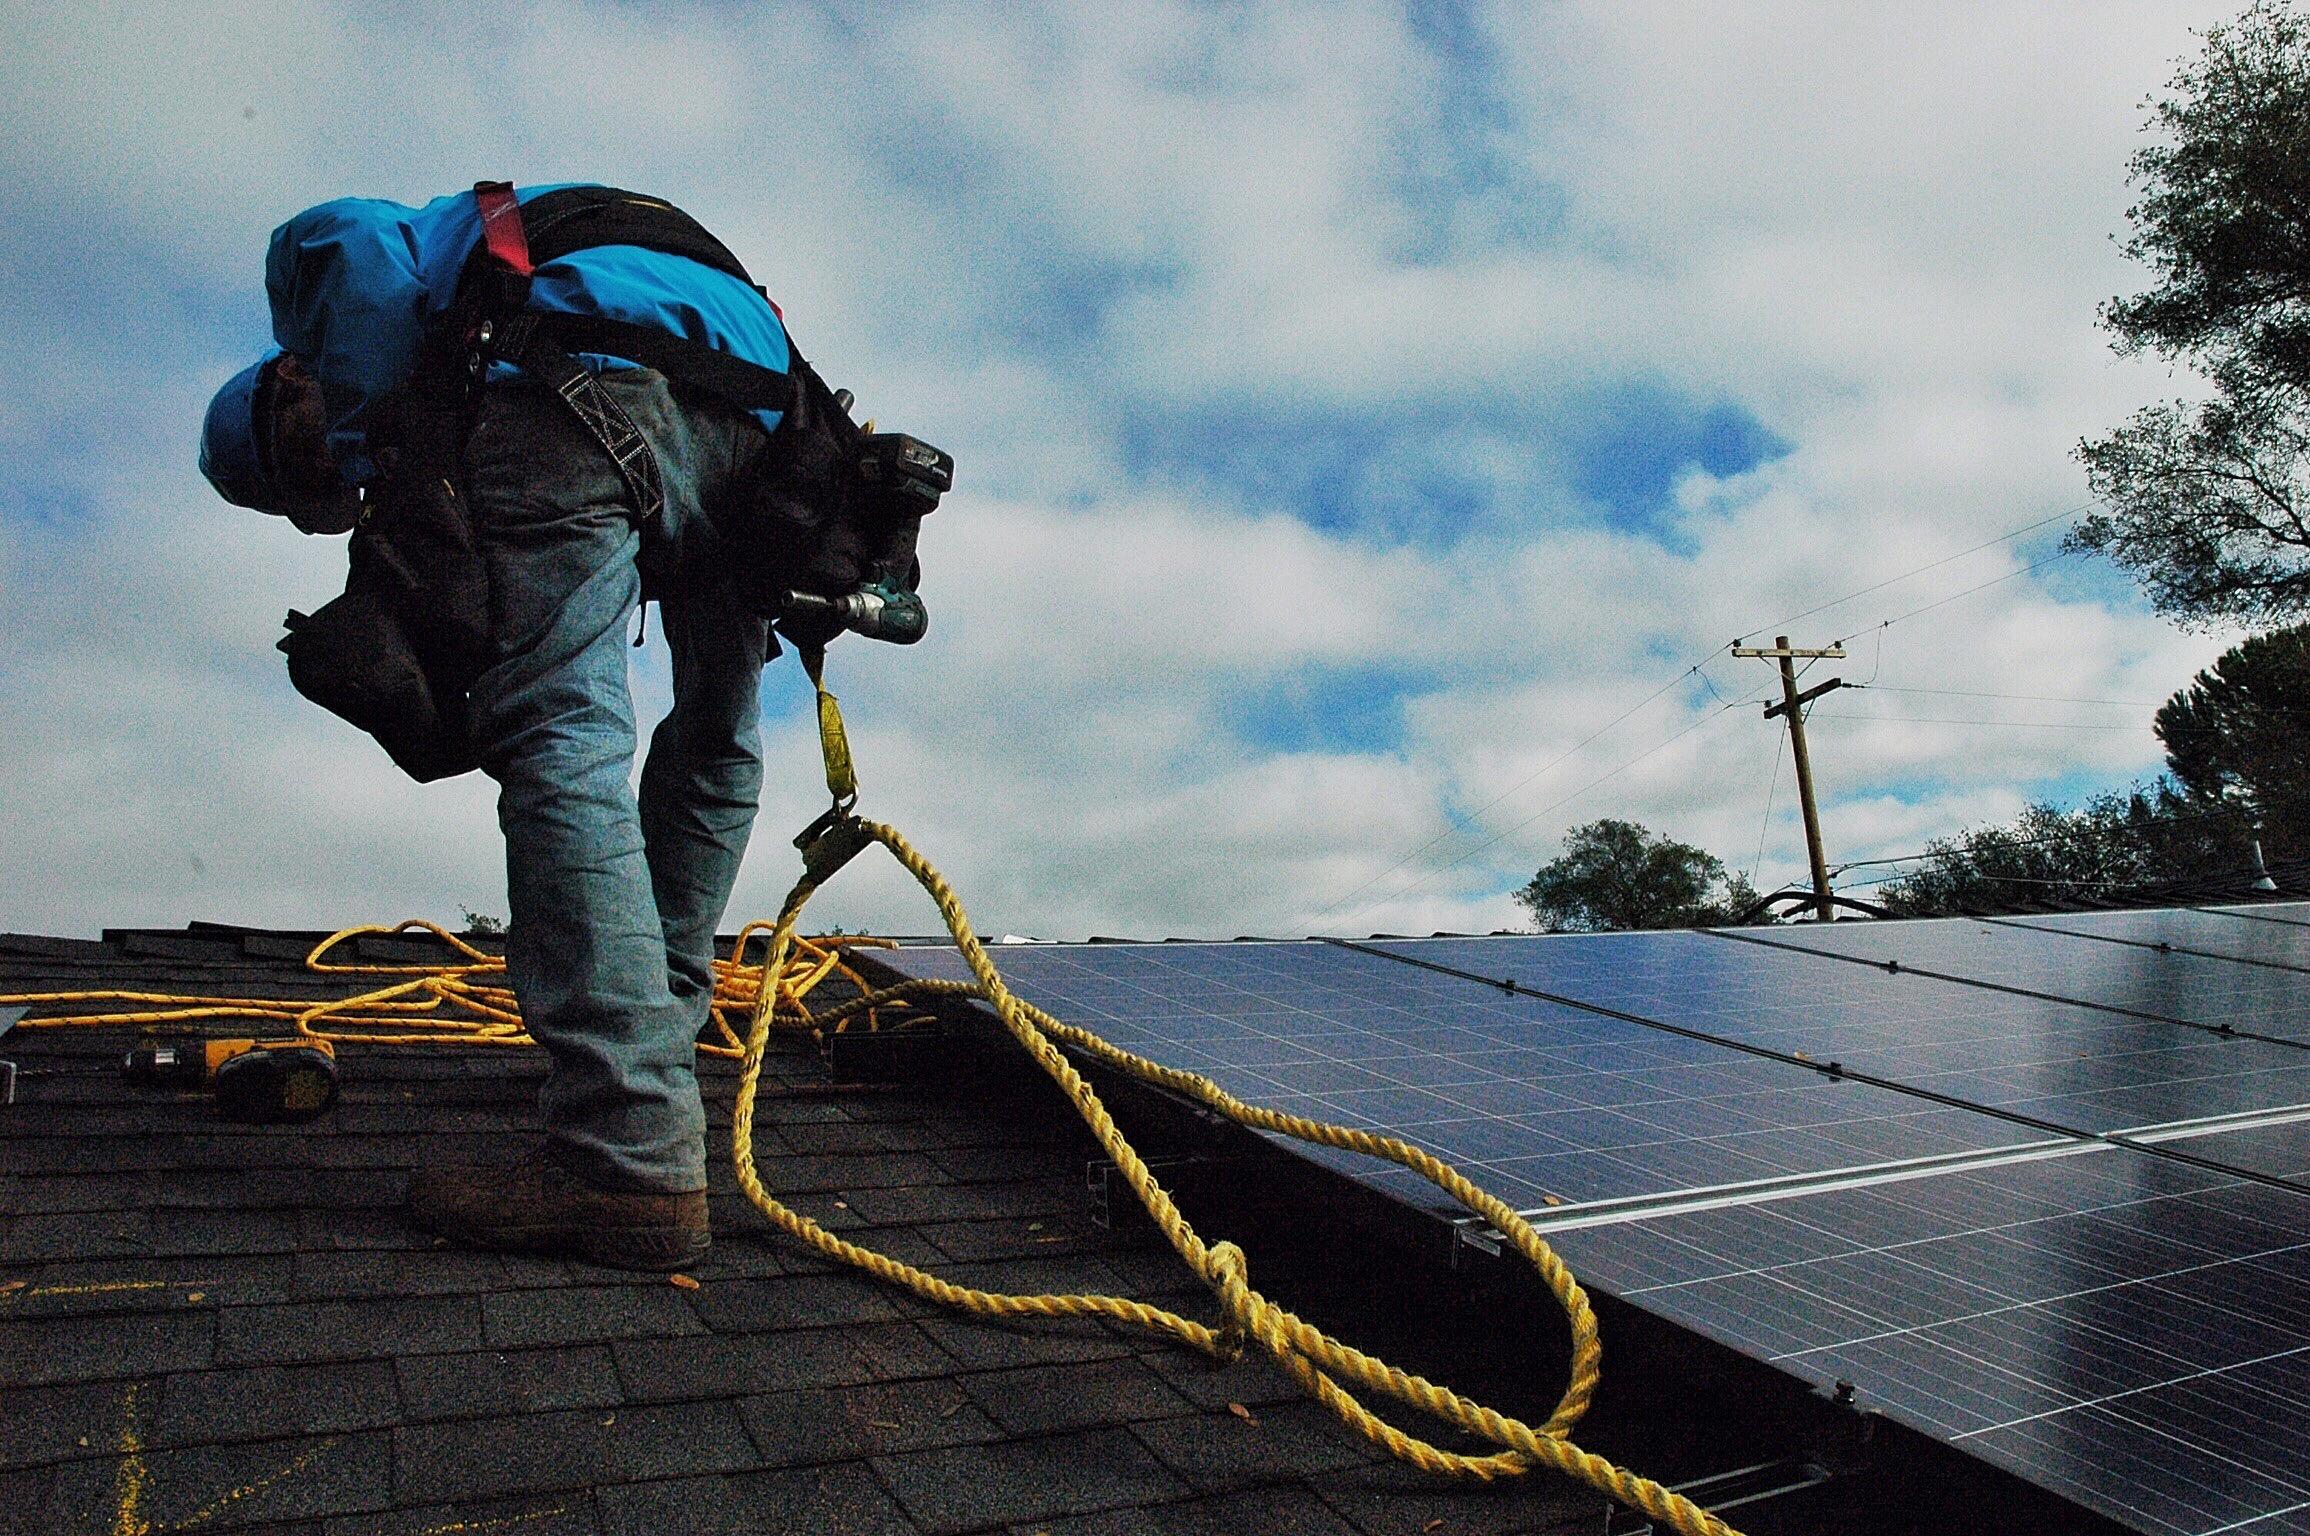 clean-reusable-energy-solar-panels-instillation-in-northern-california_t20_bkpA0g.jpg